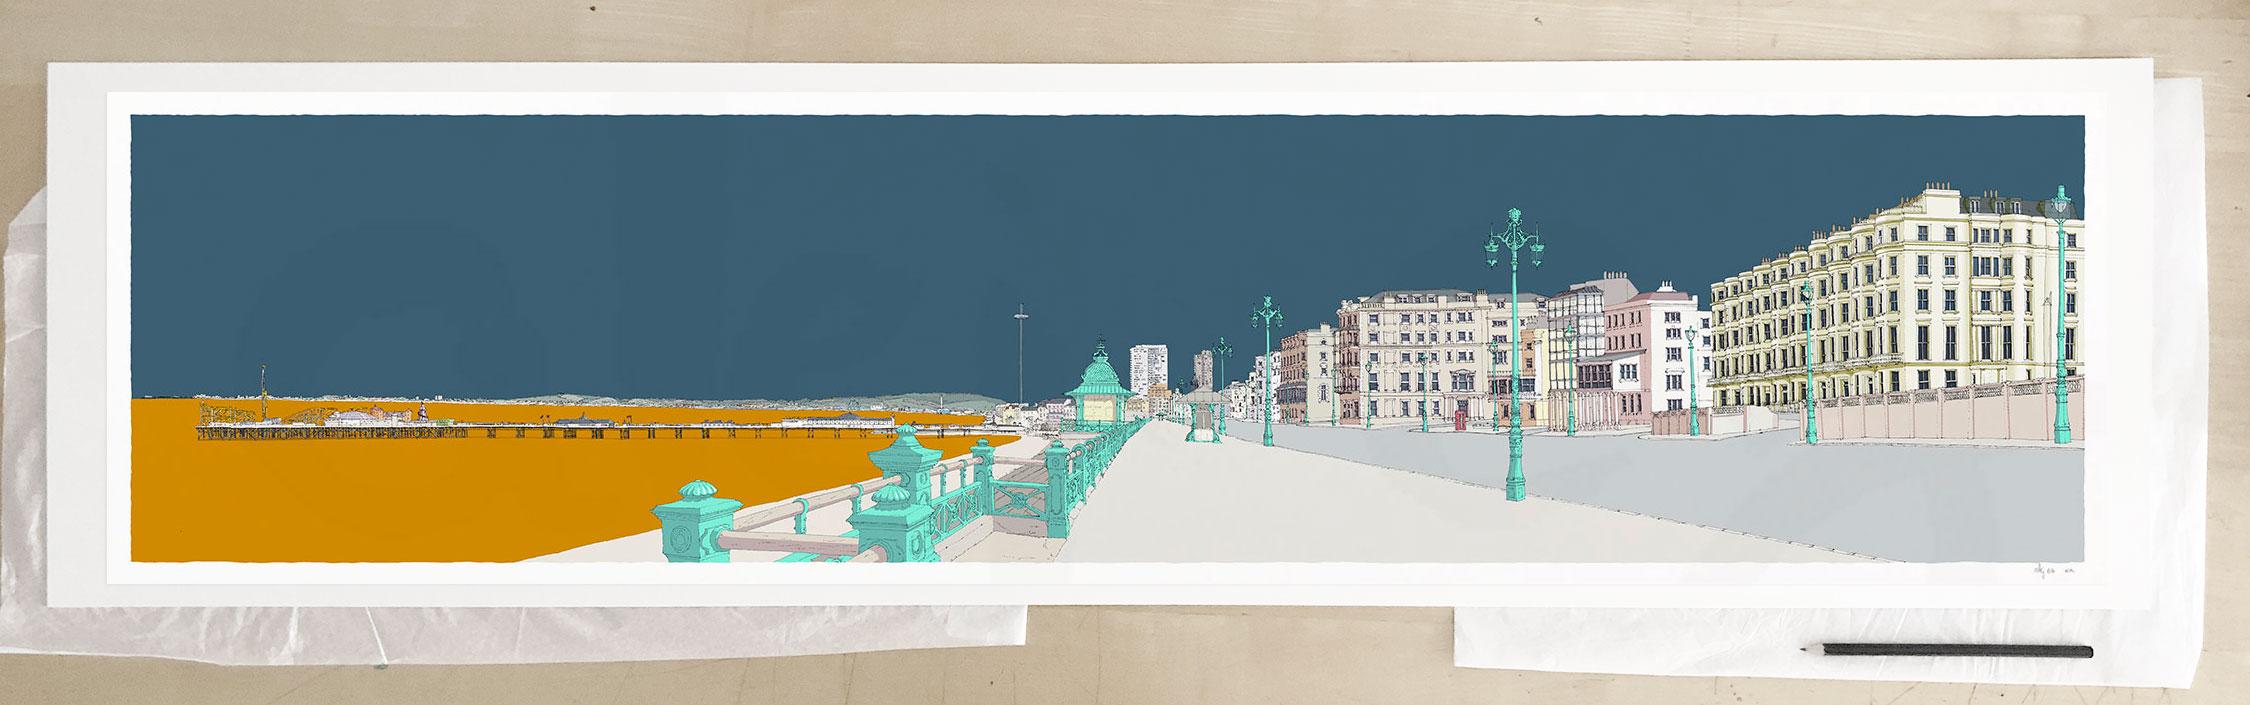 Fine art print by UK artist alej ez titled Kemptown Brighton Beach Promenade Antique Blue and Ochre